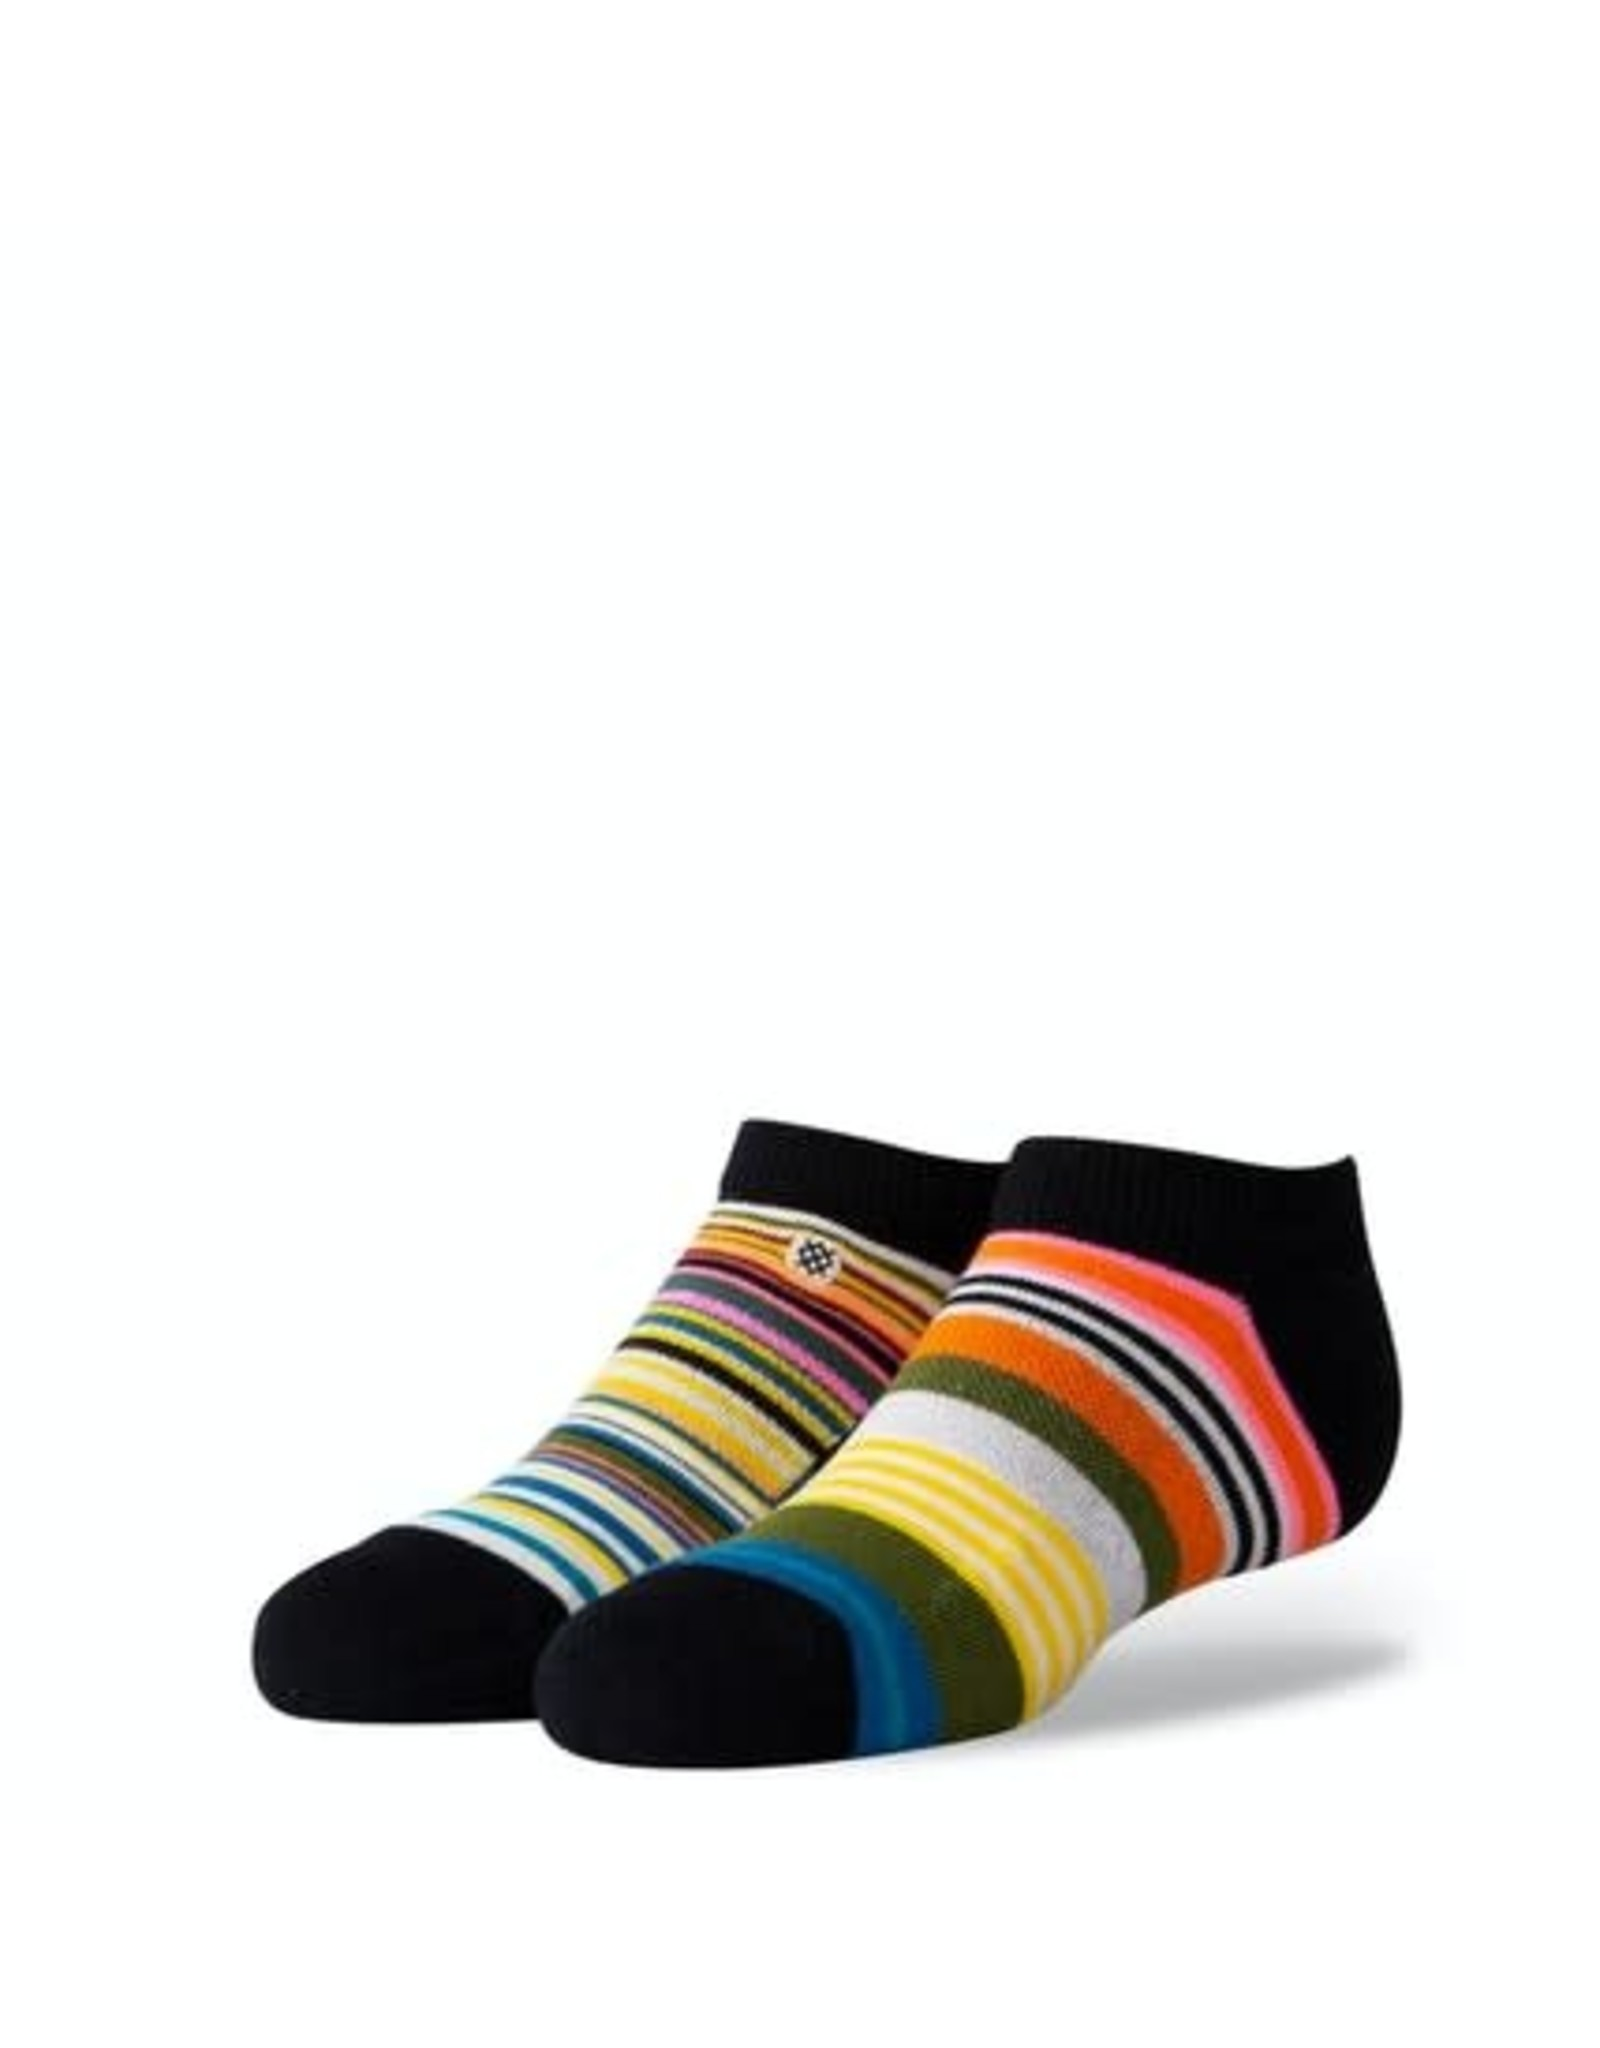 Stance Socks Stance Casual Crayon Box Kids